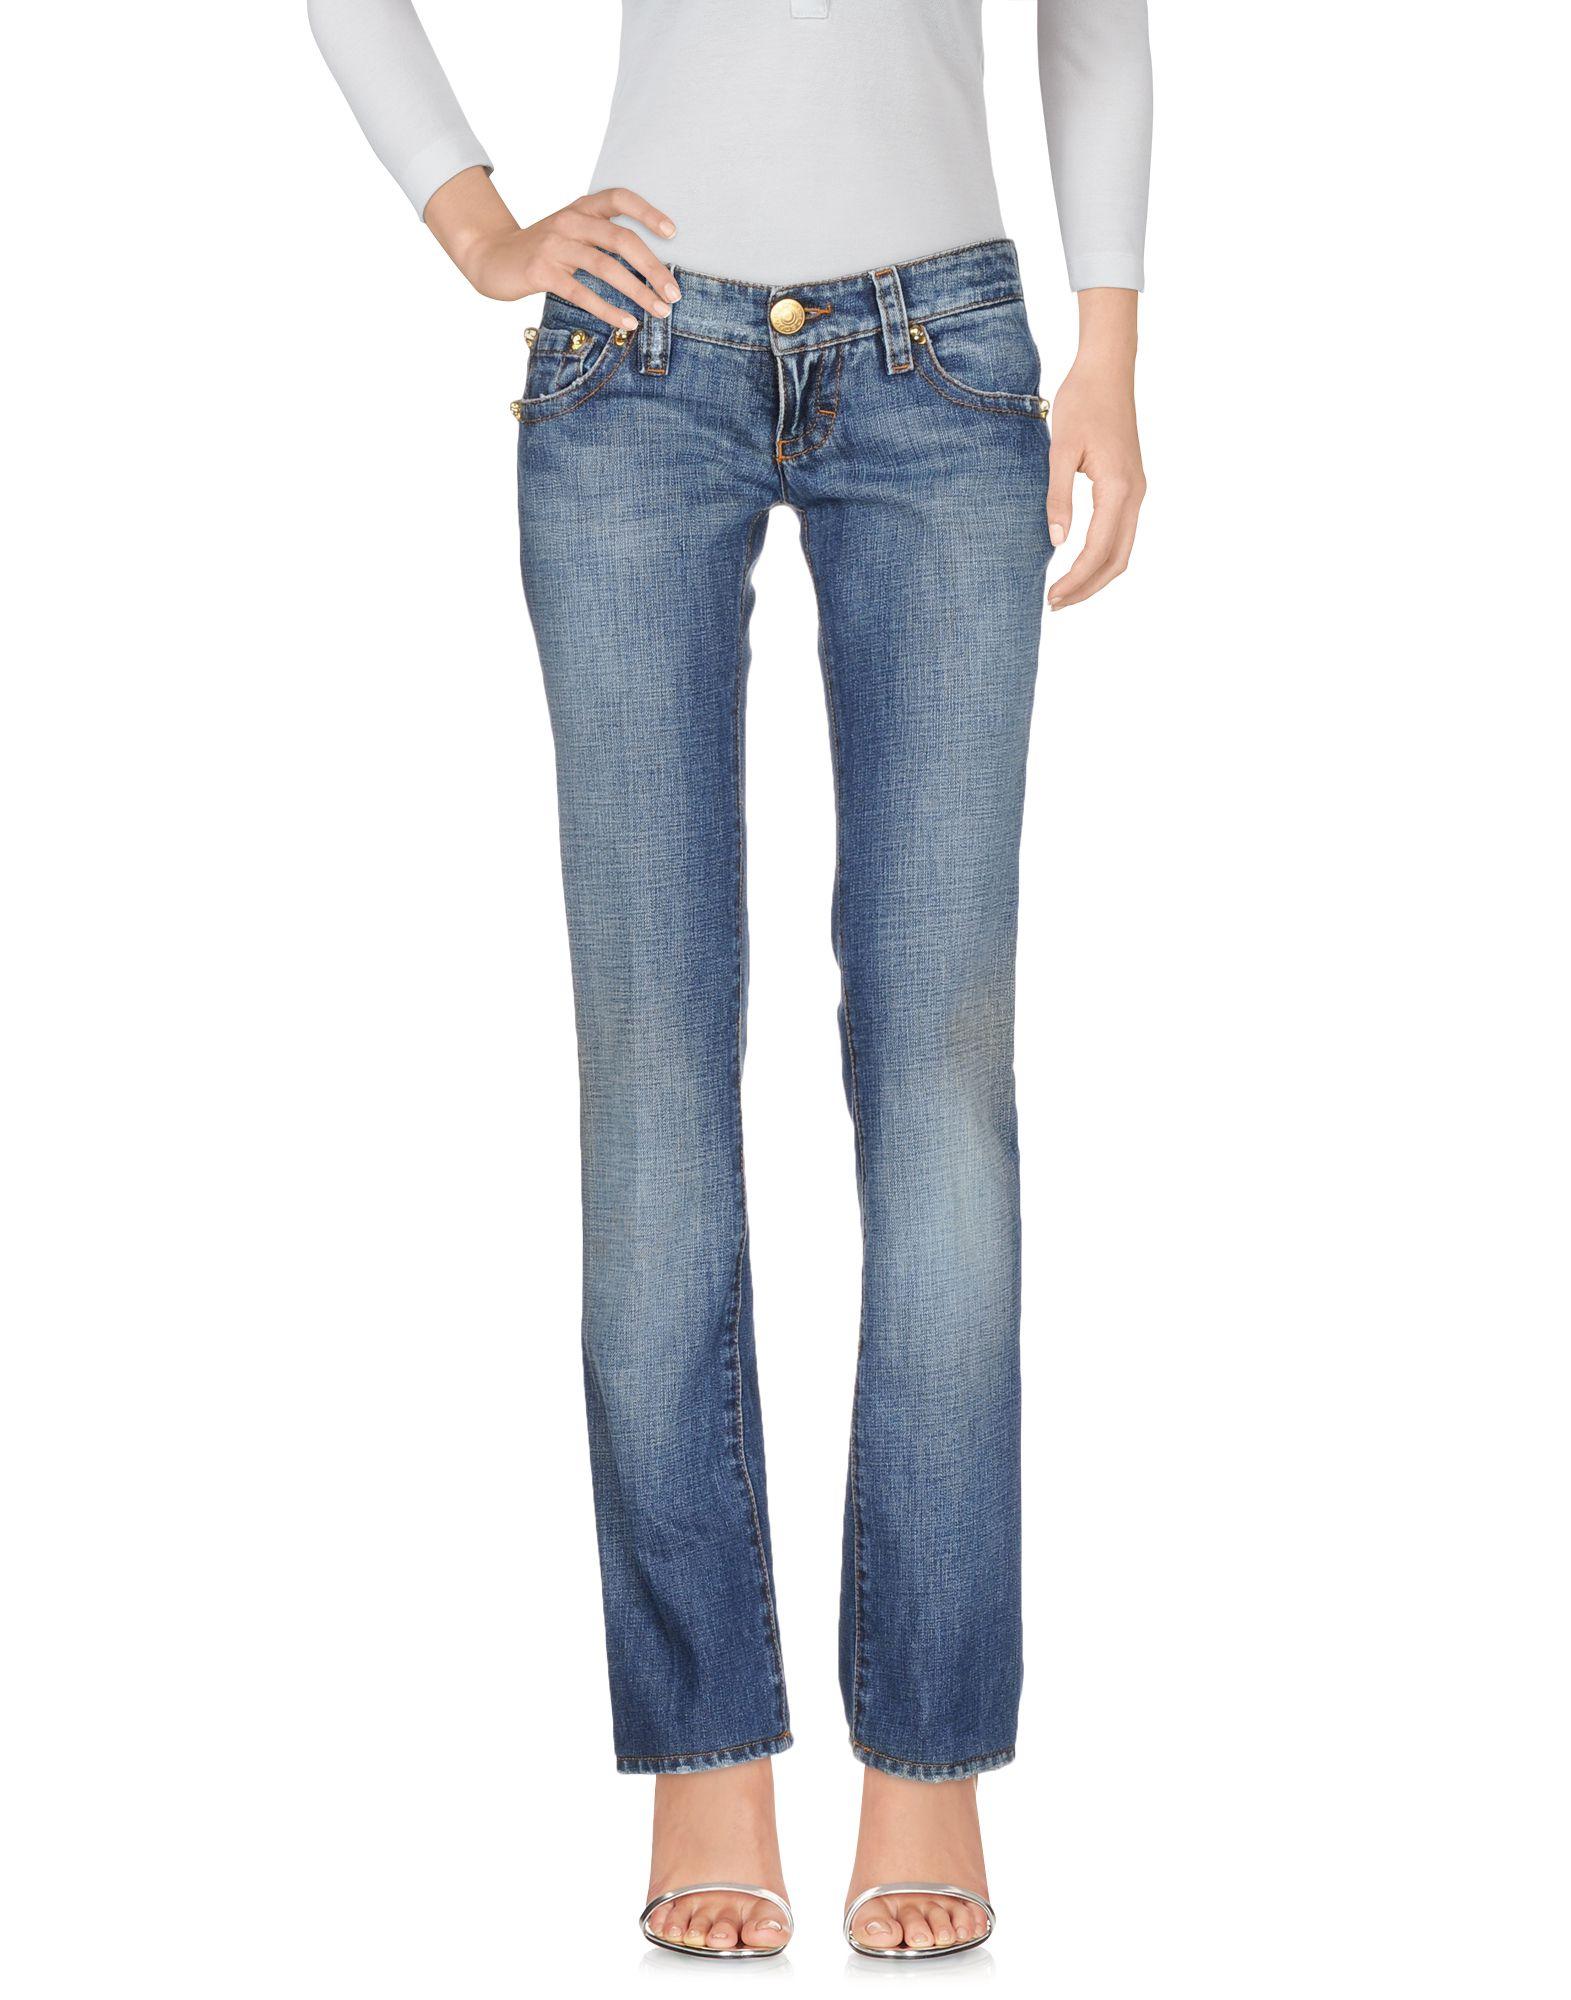 Pantaloni Jeans Dsquared2 Donna - Acquista online su JYN77Kl